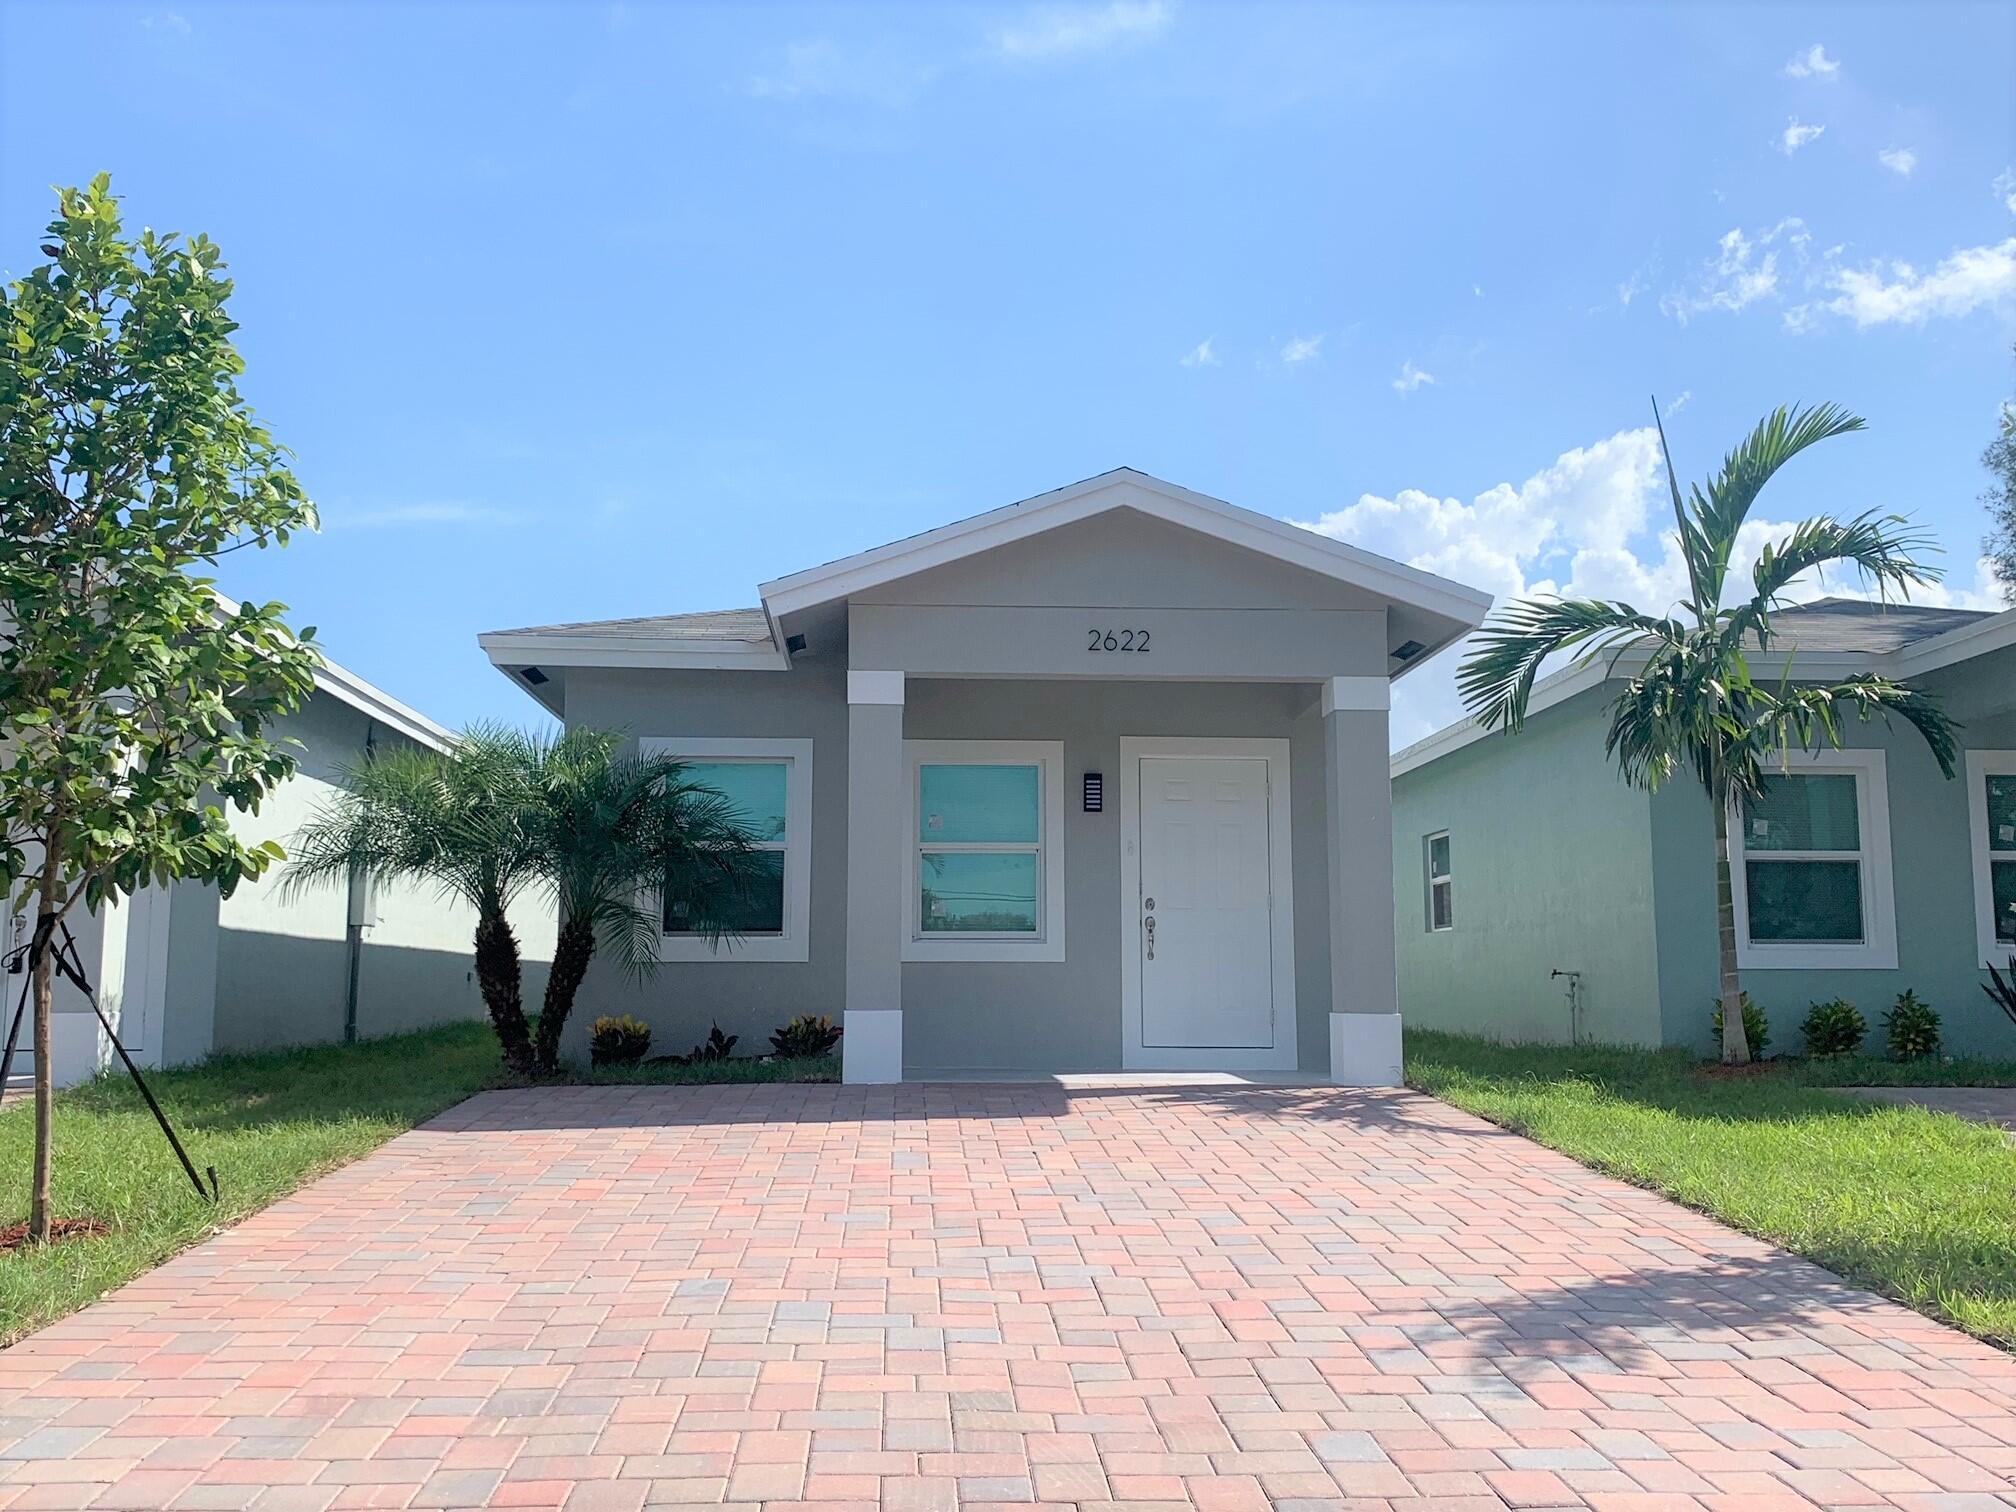 Photo of 2618 Saginaw Avenue, West Palm Beach, FL 33409